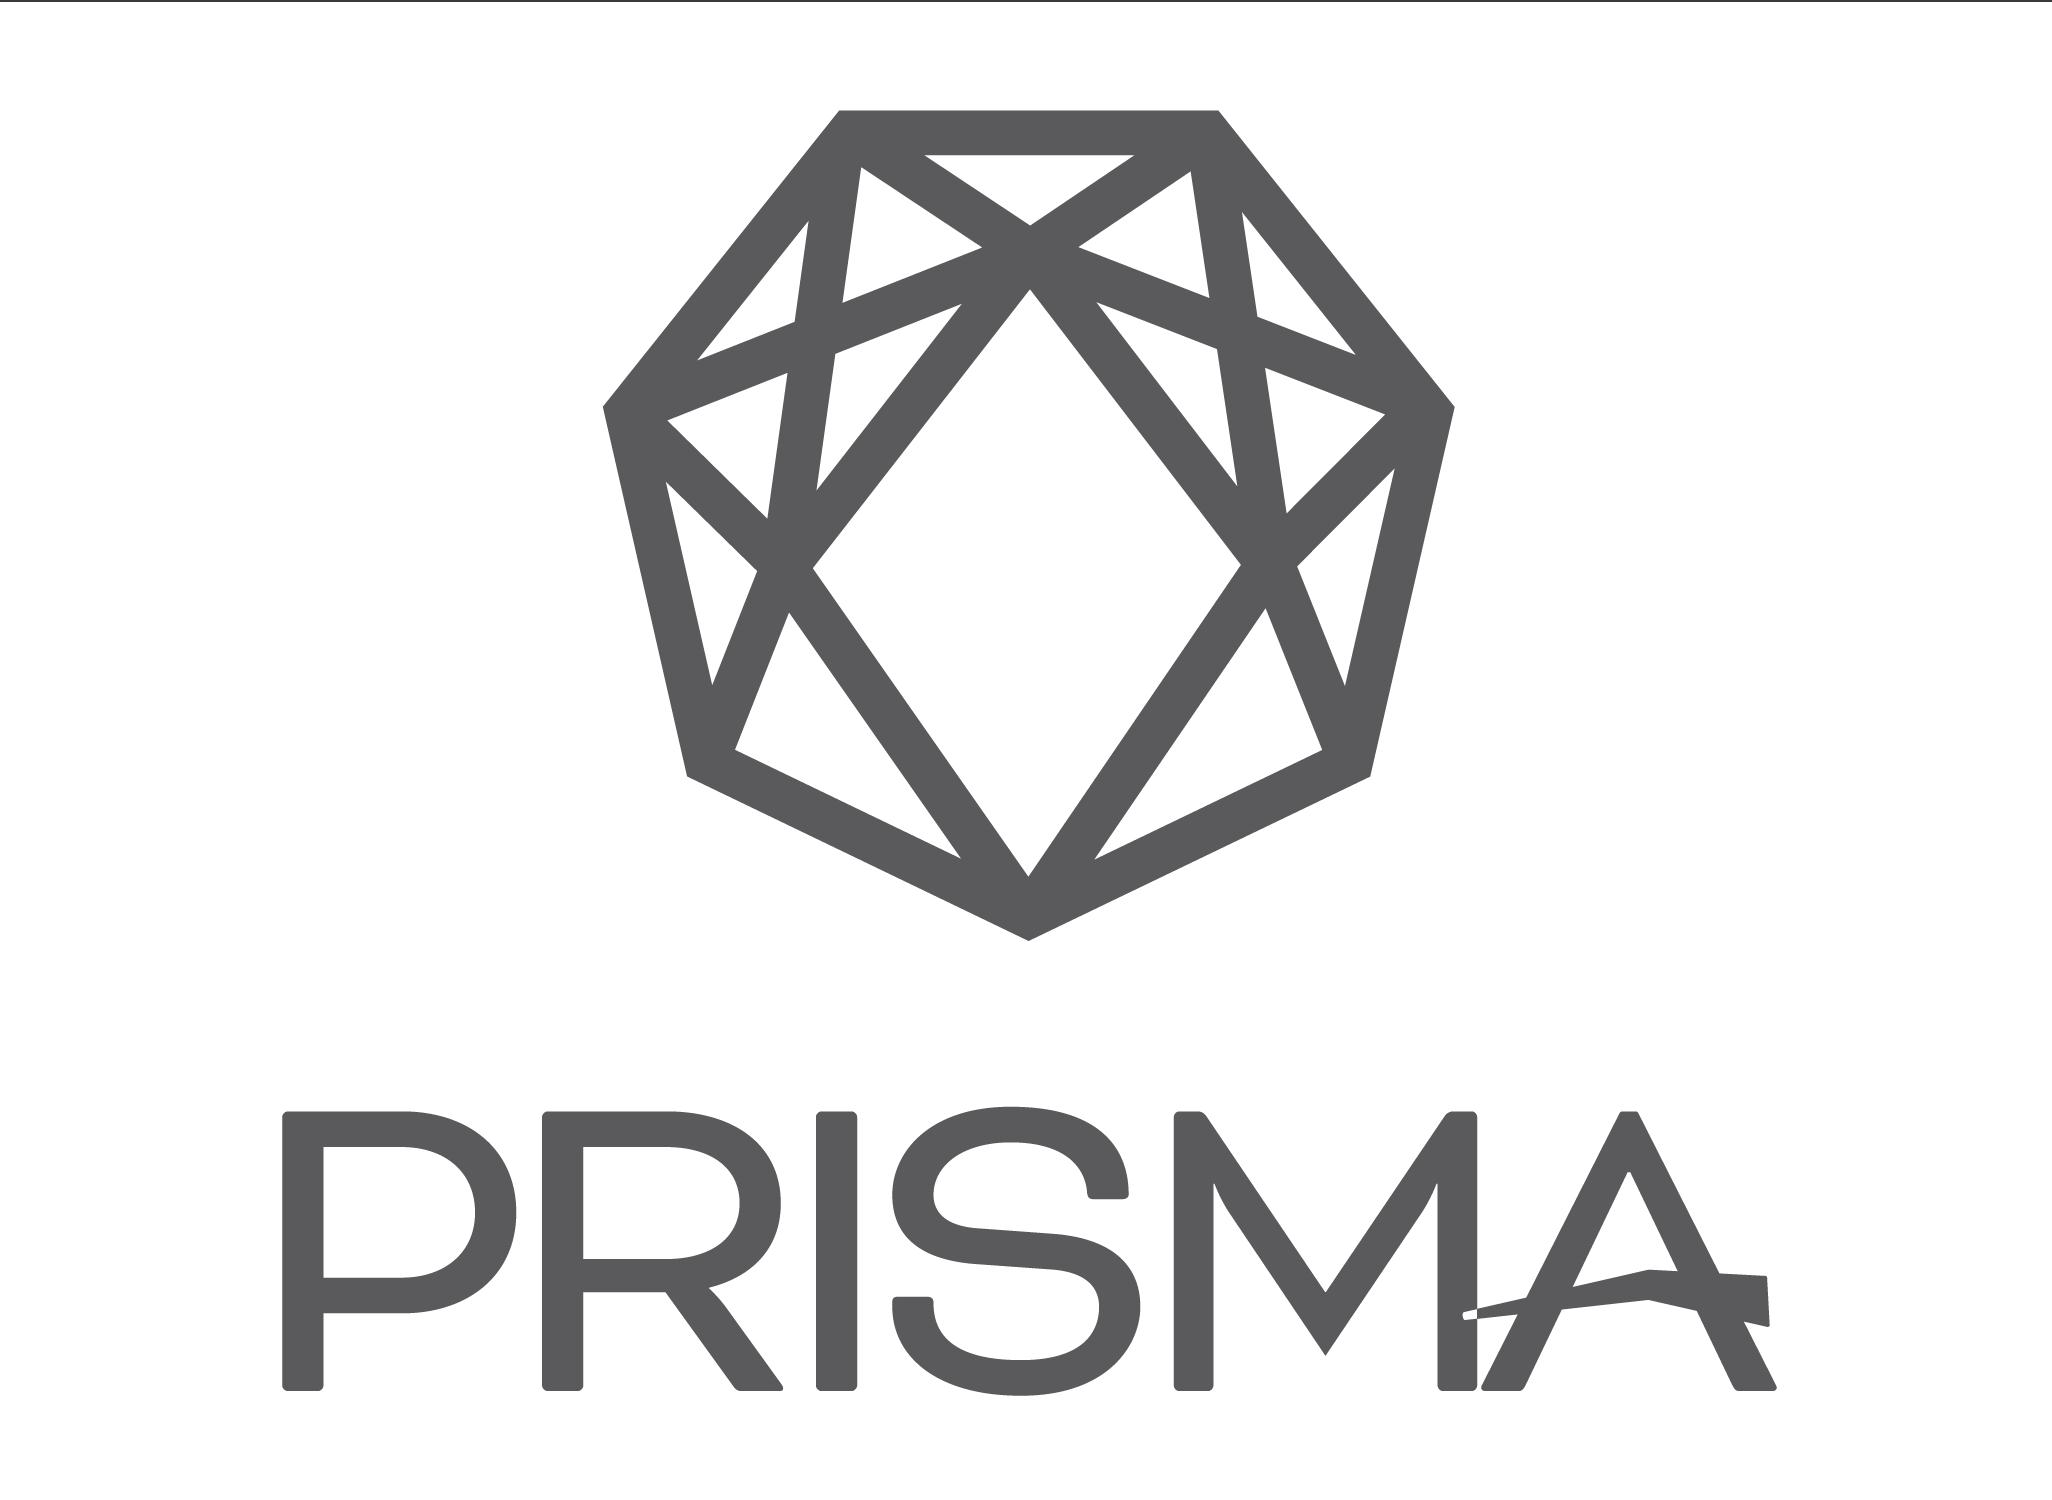 image of Prisma logo